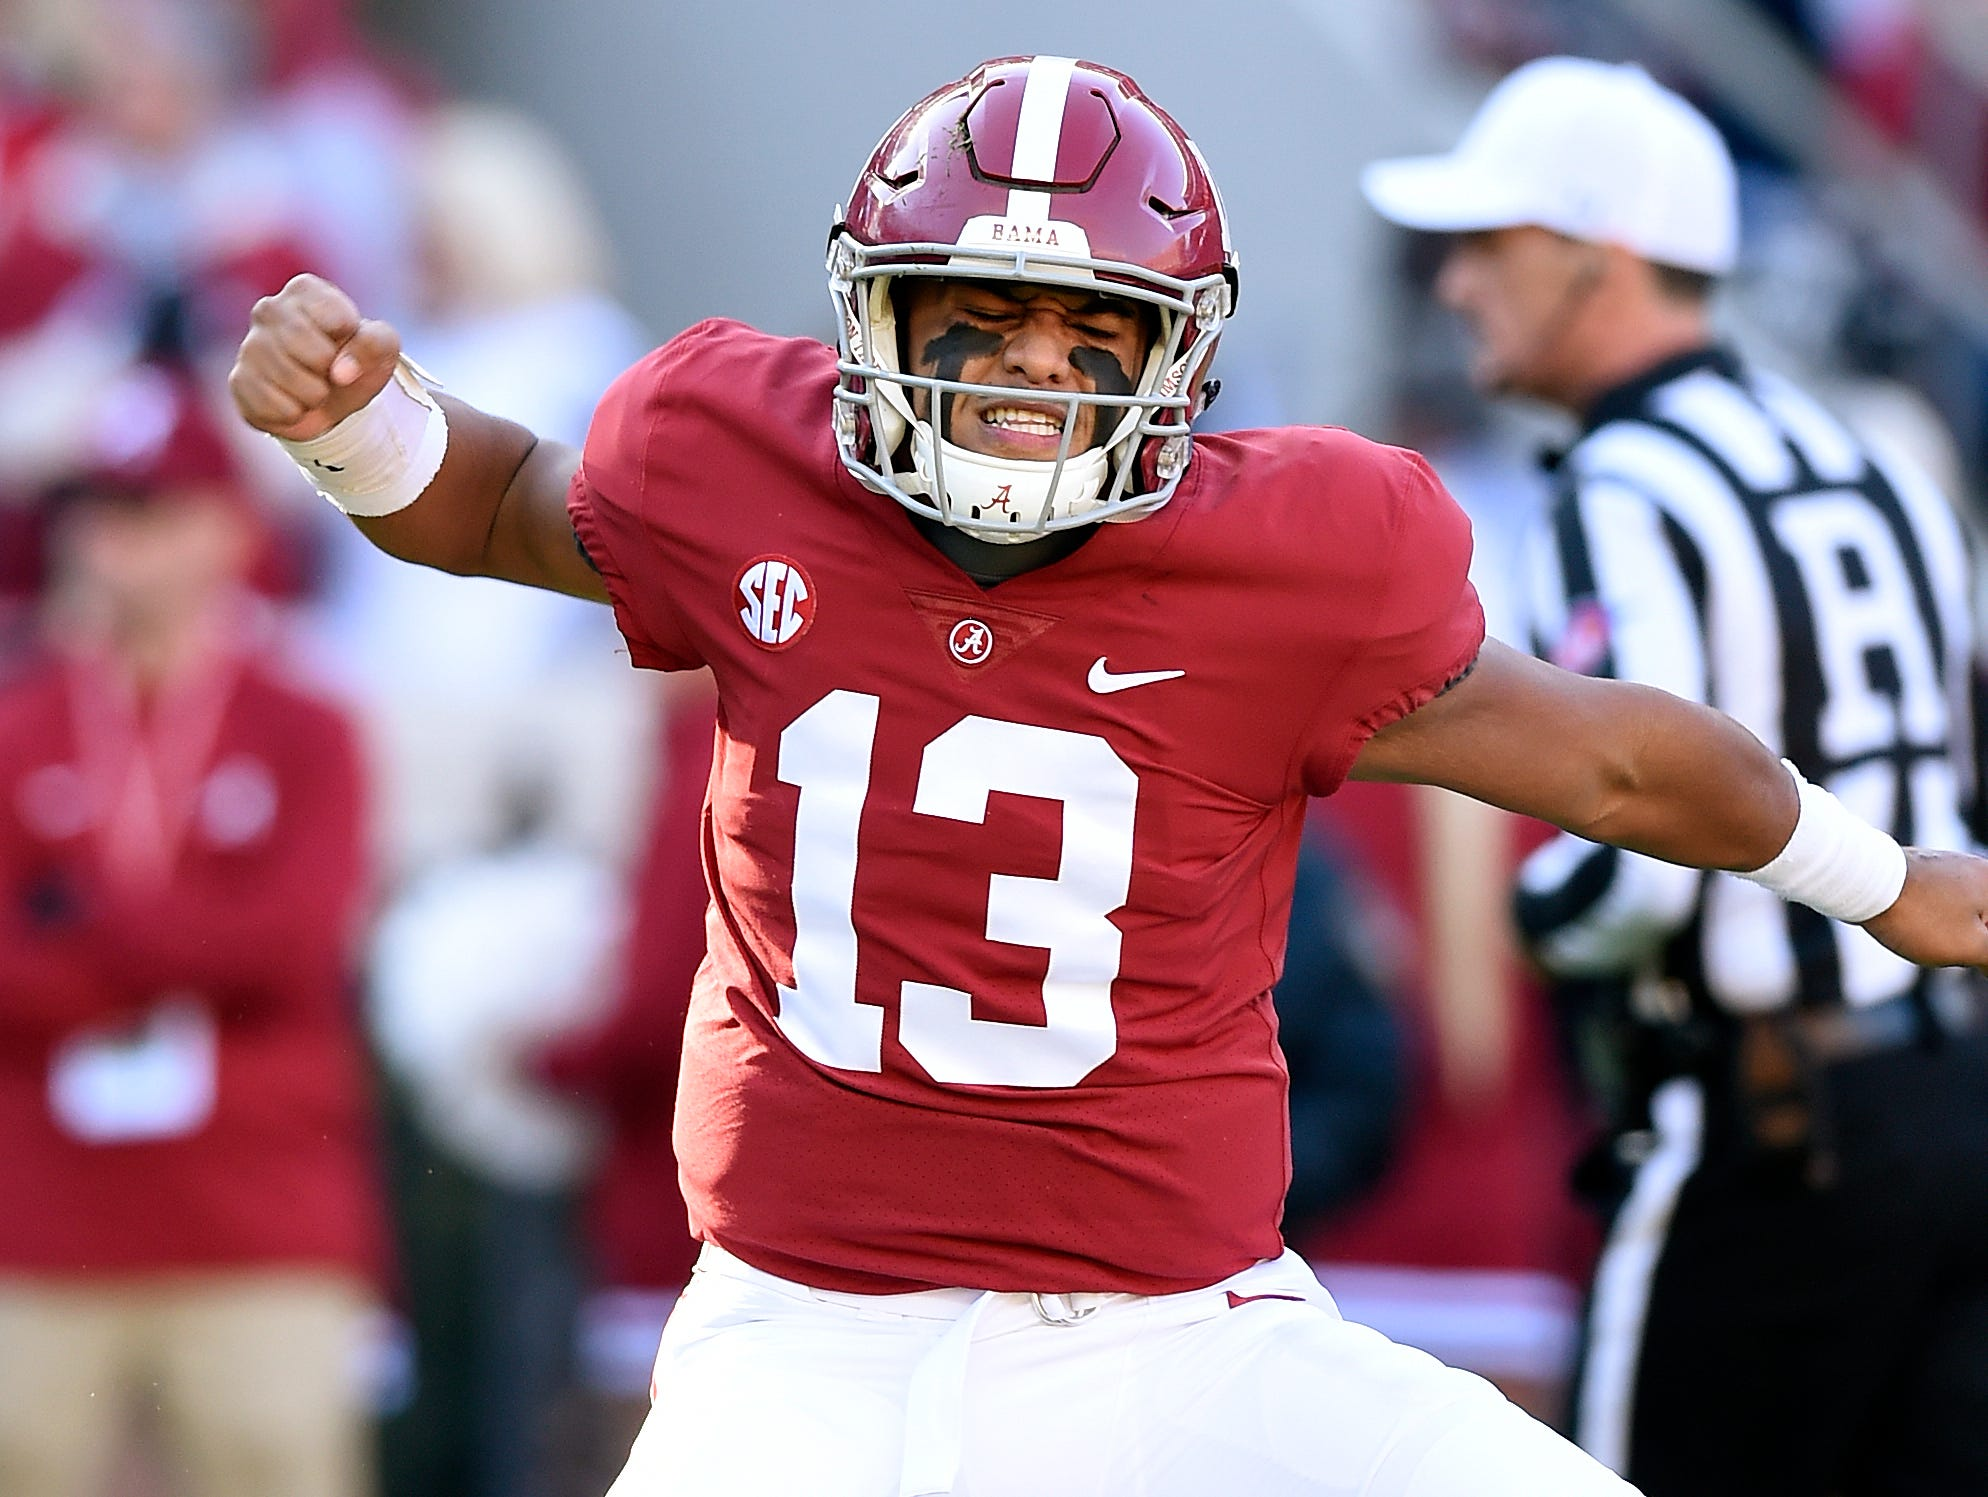 Alabama Crimson Tide quarterback Tua Tagovailoa (13) celebrates a touchdown against the Mississippi State Bulldogs during the first quarter at Bryant-Denny Stadium.